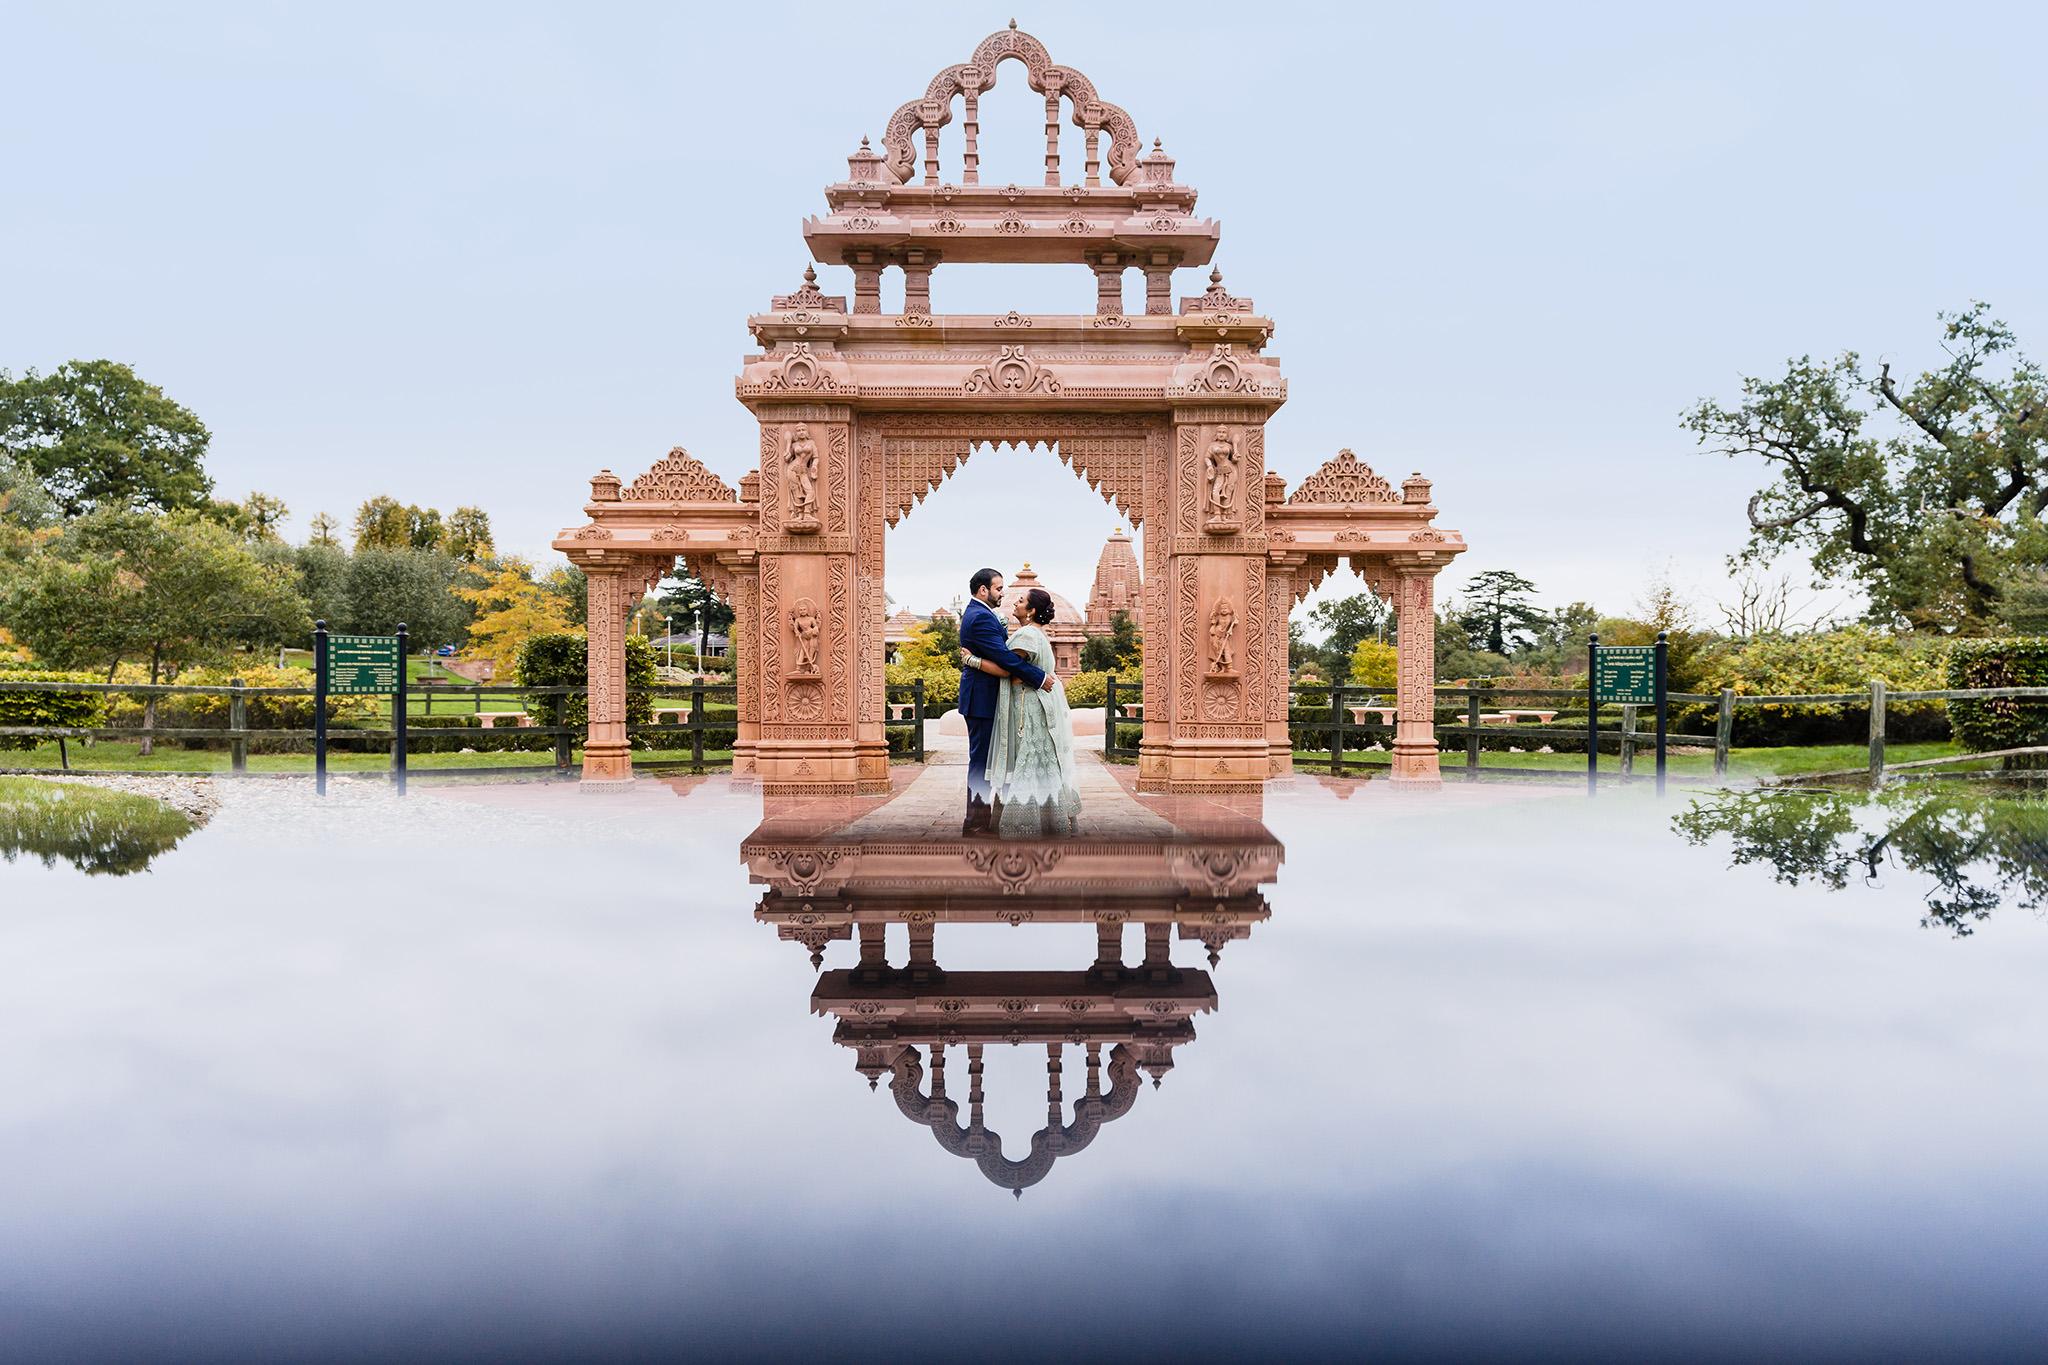 posed wedding photo